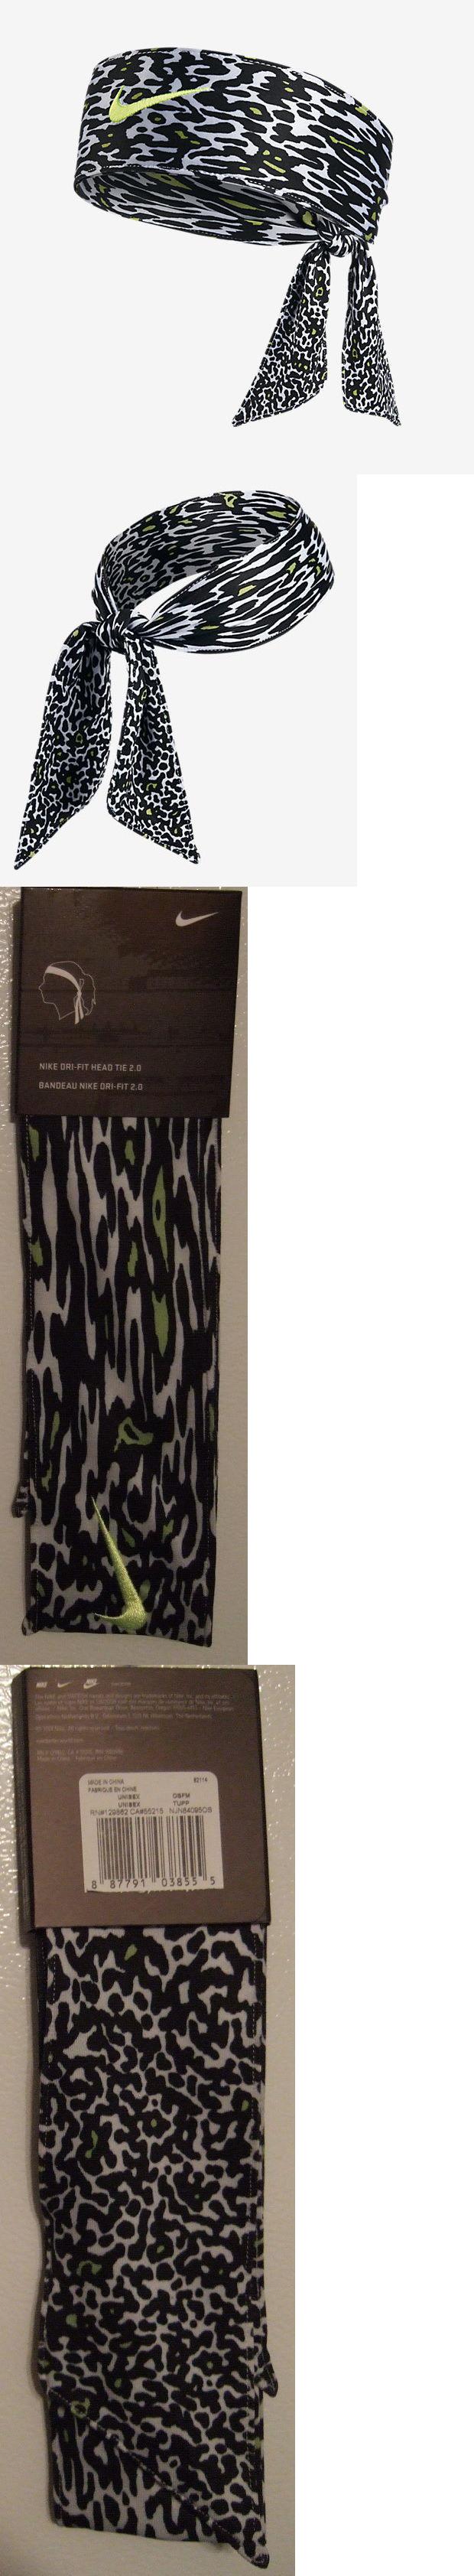 Hats and Headwear 159160  New Womens Nike Head Tie Skylar Diggins 2.0  Cheetah Headband Tennis 76286dfde80